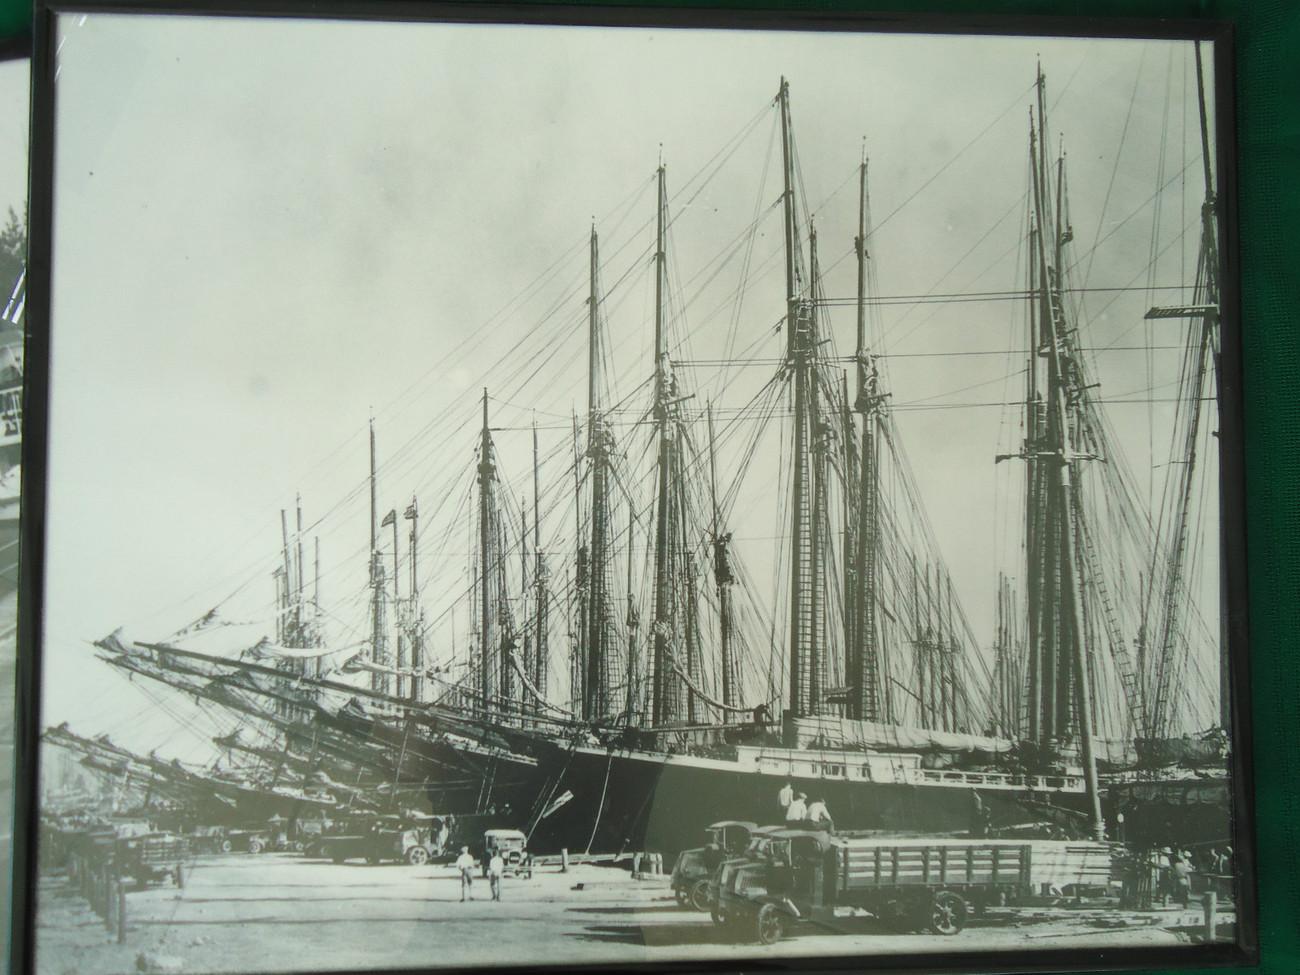 4 Photographic Prints of 1913-1926 Old Florida: Port Miami, Everglades, Whale